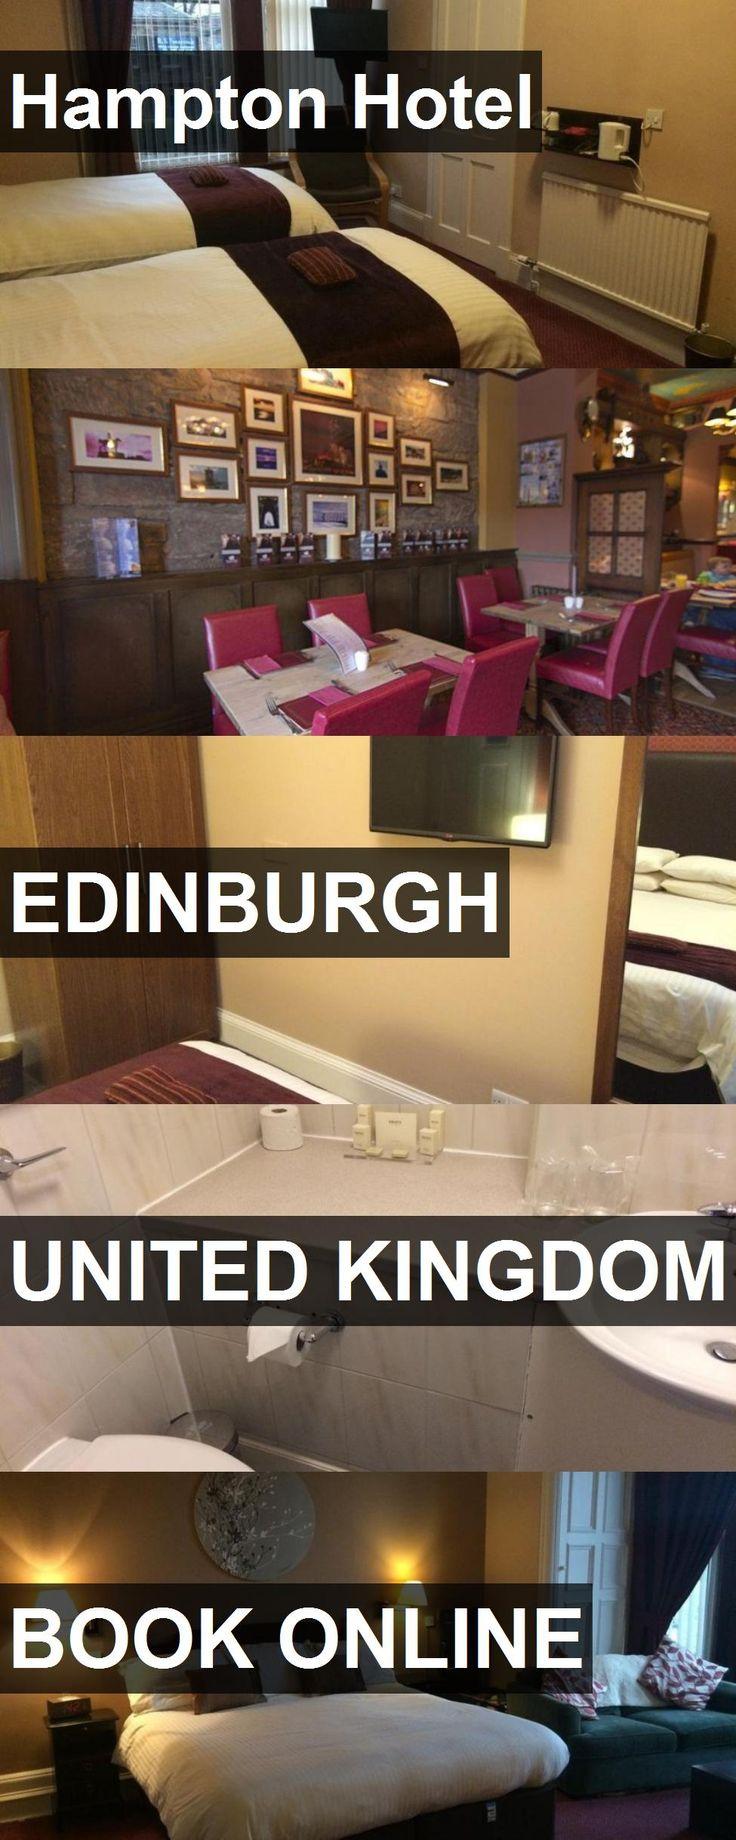 Hampton Hotel in Edinburgh, United Kingdom. For more information, photos, reviews and best prices please follow the link. #UnitedKingdom #Edinburgh #travel #vacation #hotel